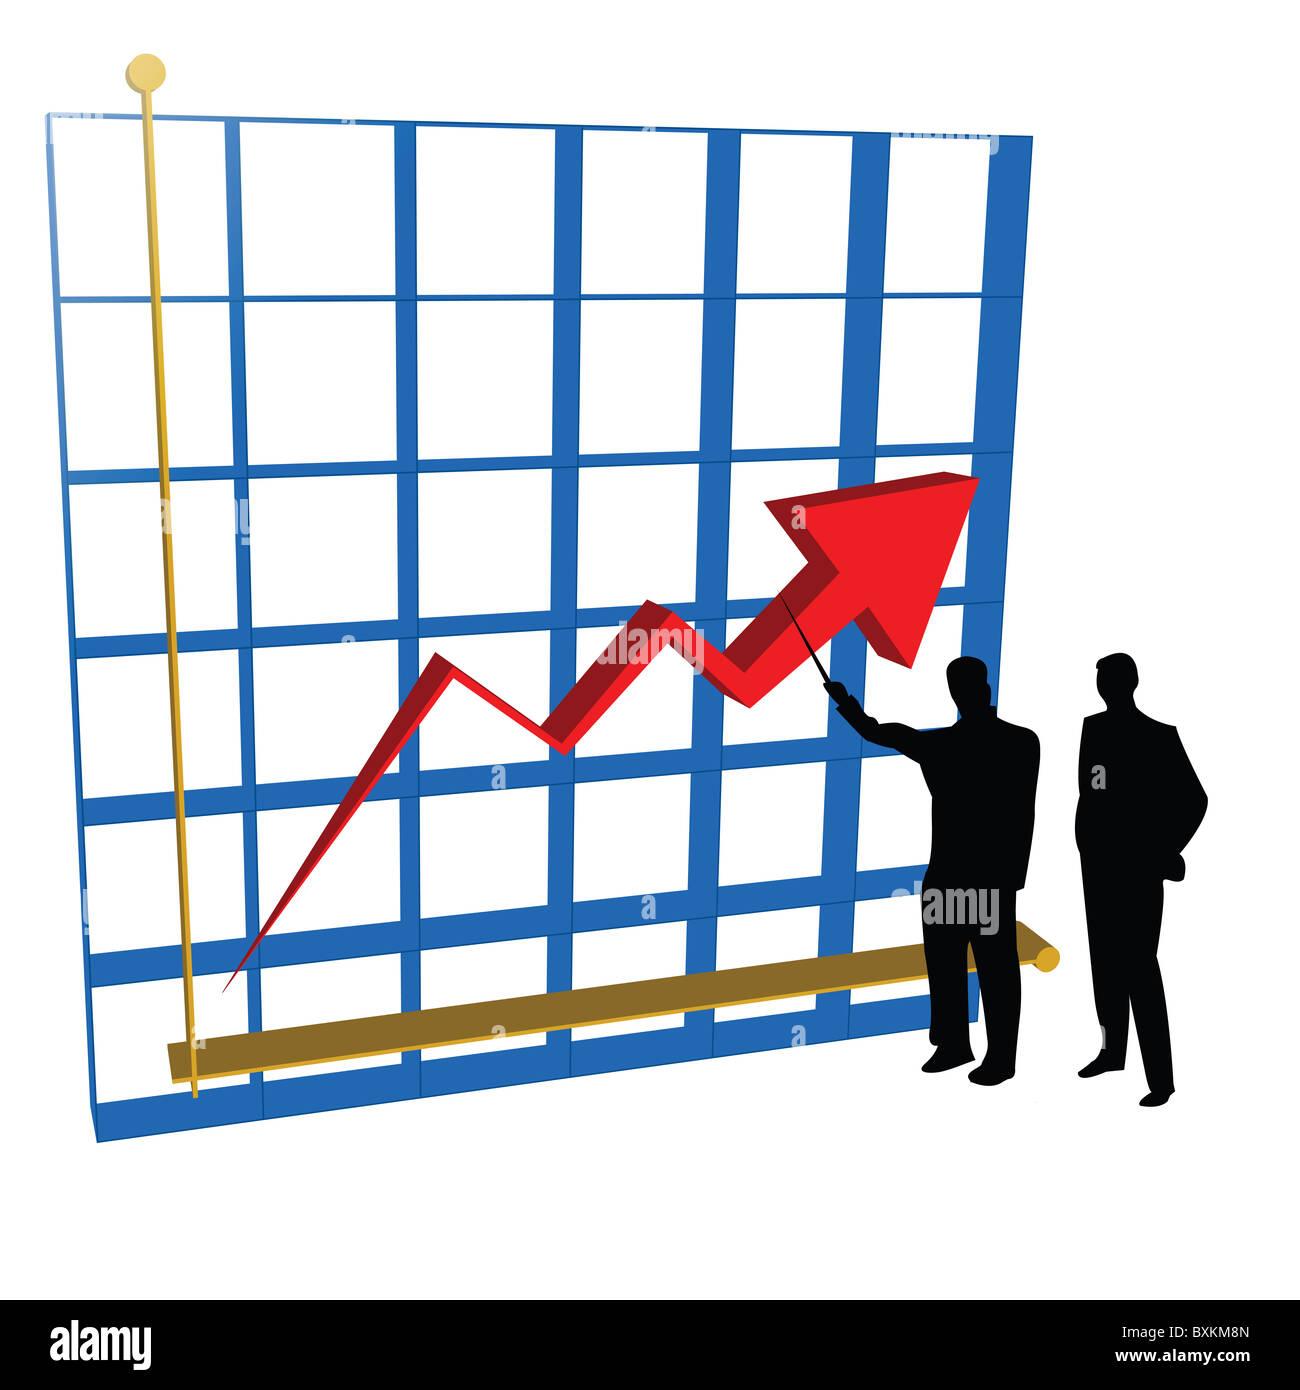 graphic diagram - Stock Image